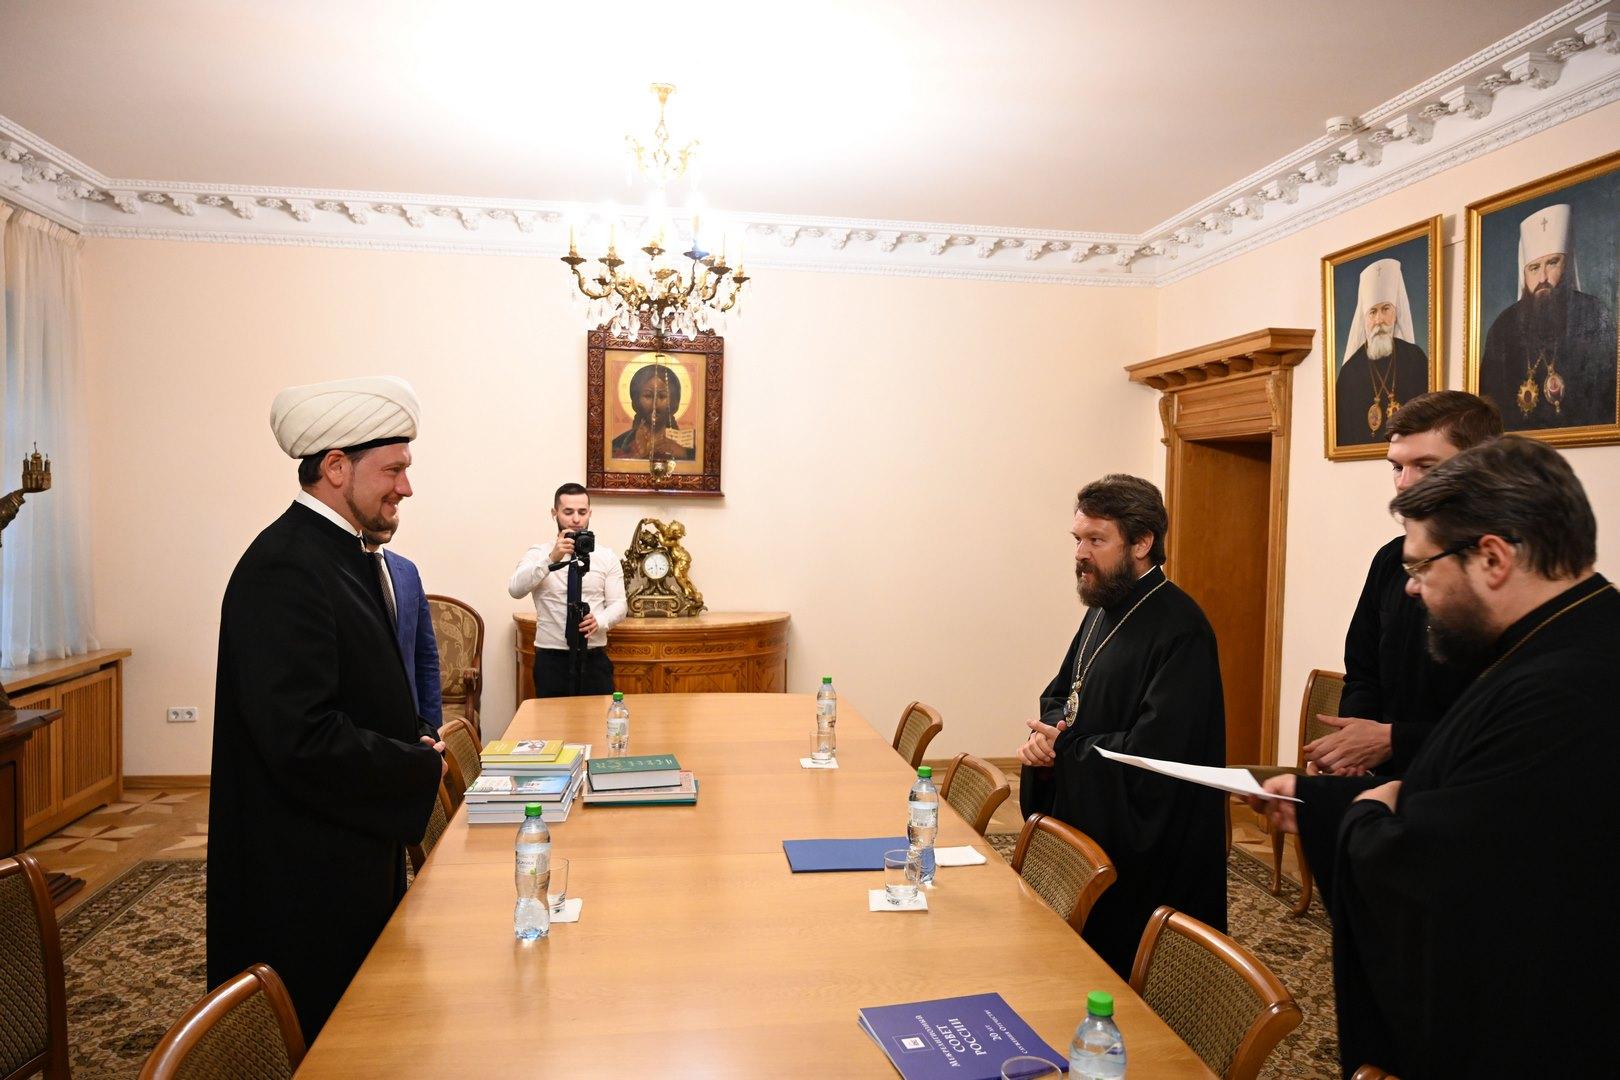 Митрополит Иларион встретился с первым зампредседателя ДУМ РФ